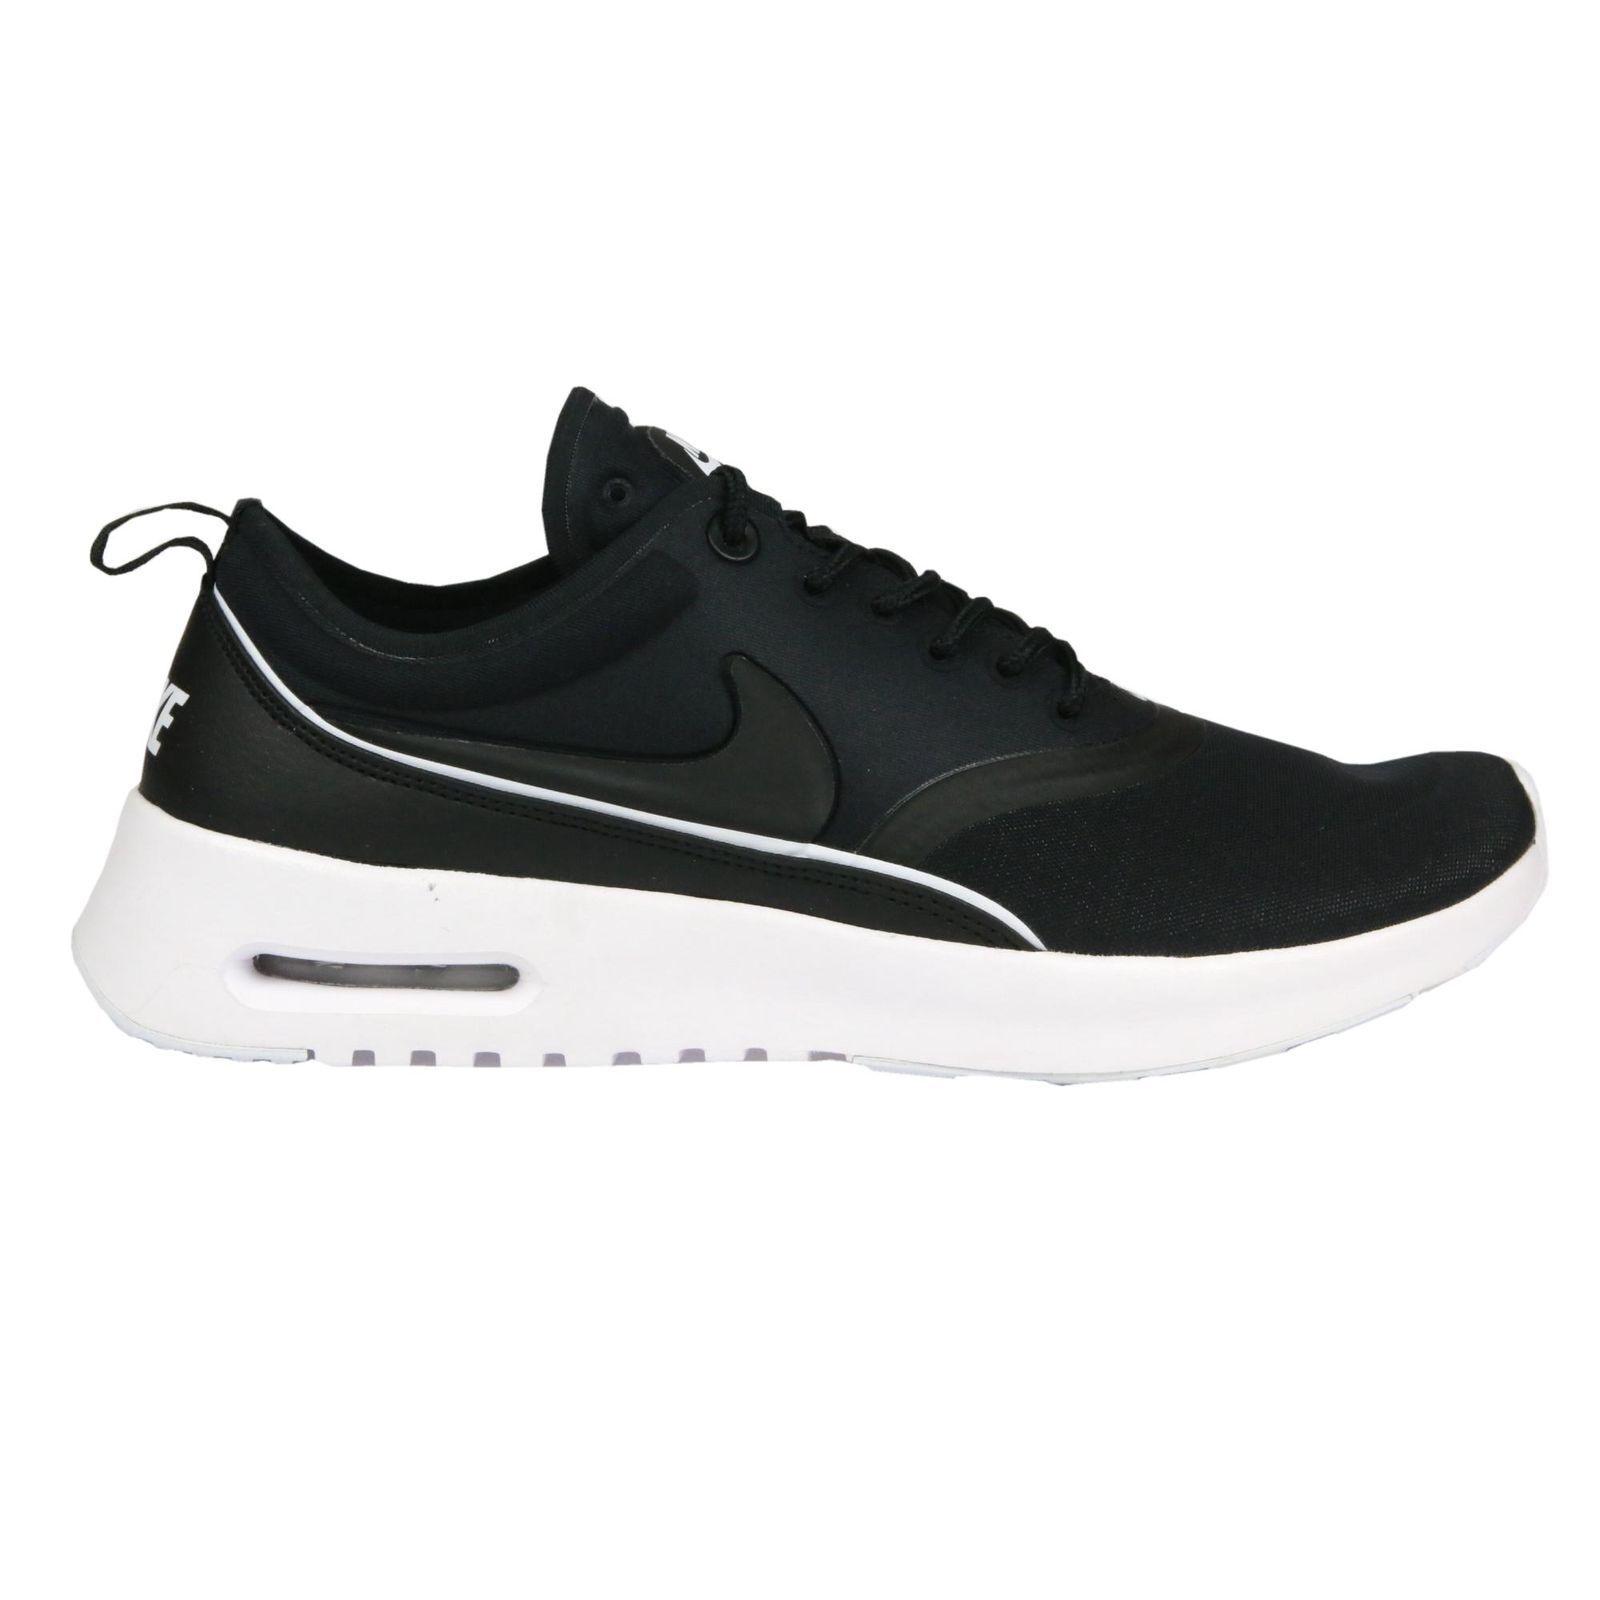 Nike Damenschuhe Damenschuhe Nike Air Max Thea Ultra Running/Gym Trainers 844926 001 UK Größe 4.5 (72) 32ce92